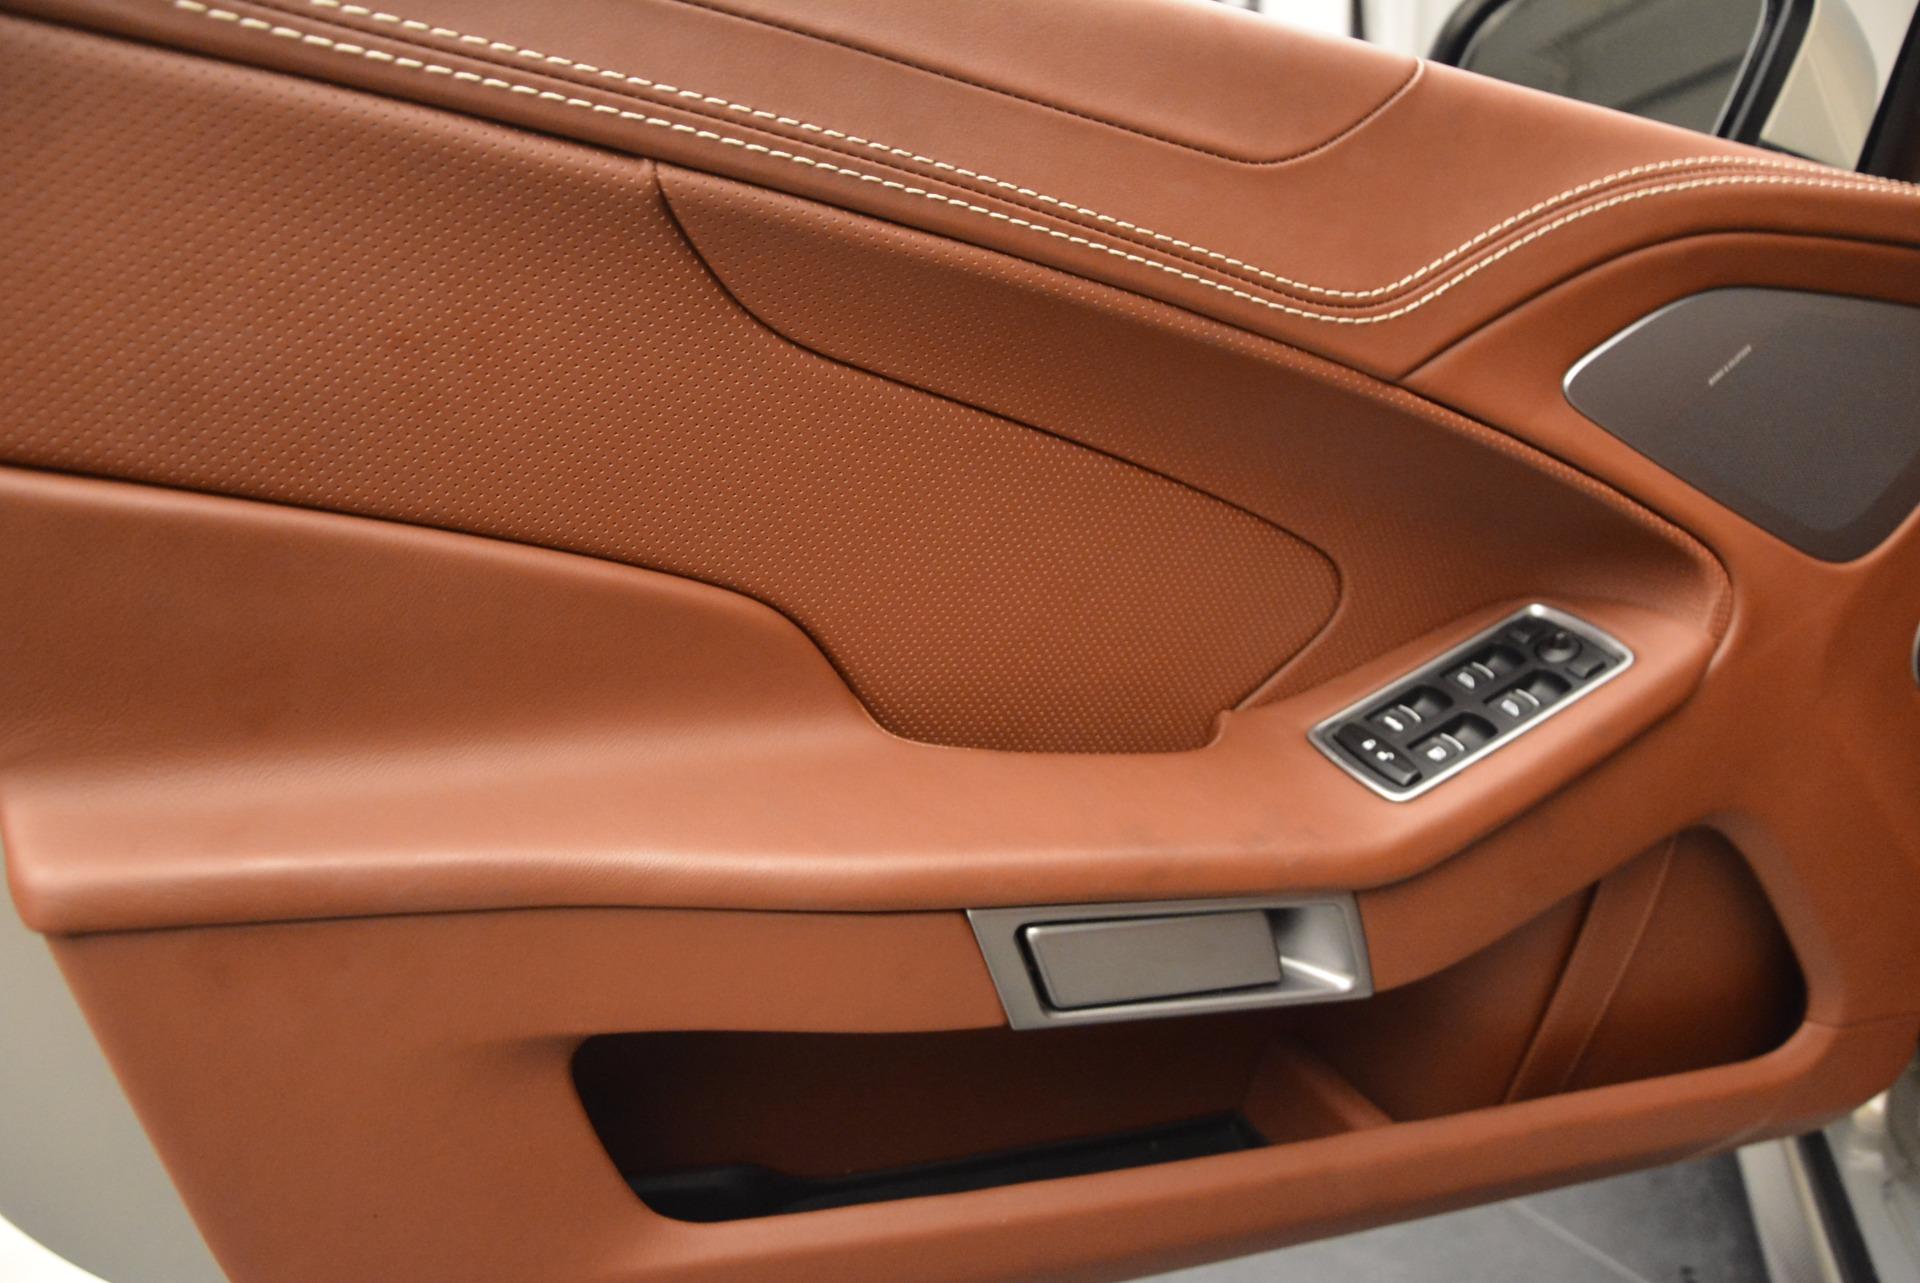 Used 2015 Aston Martin Vanquish Volante For Sale In Westport, CT 1448_p22